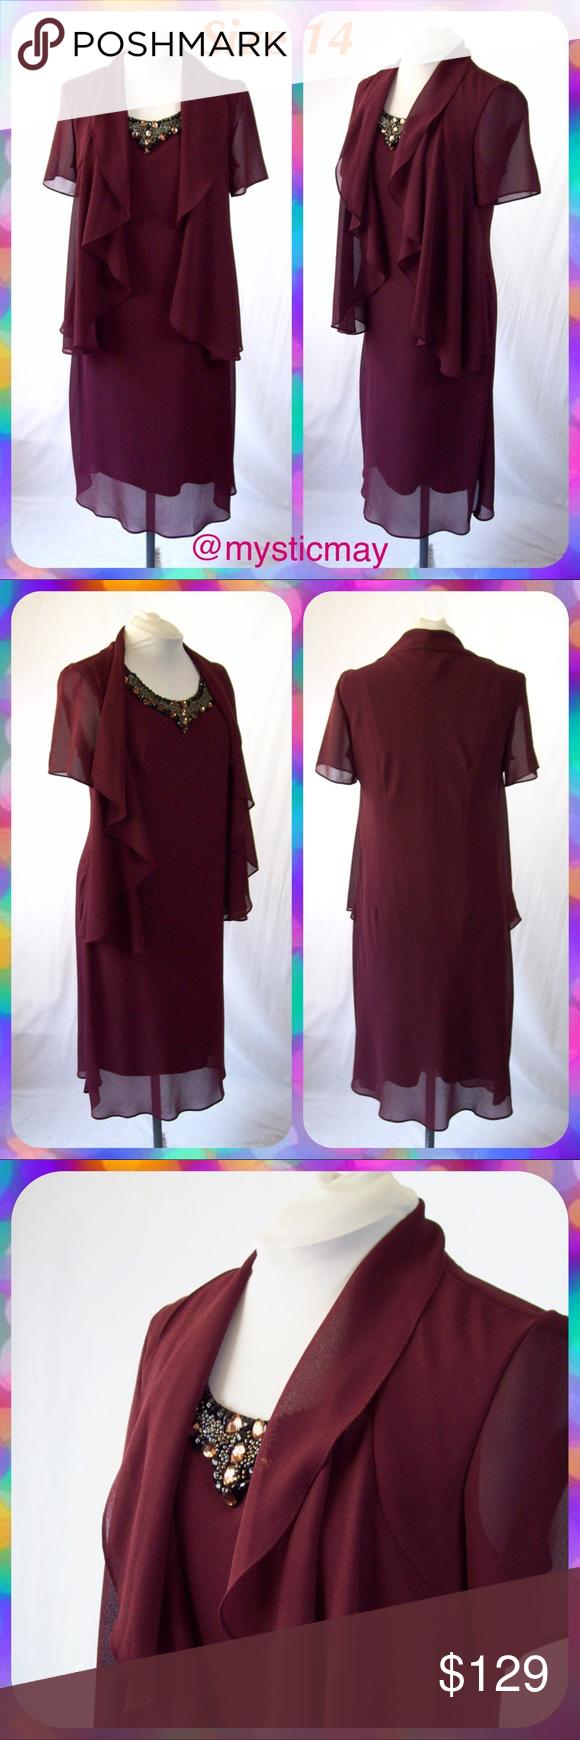 Piece burgundy chiffon jewel collar jacket dress beautifully